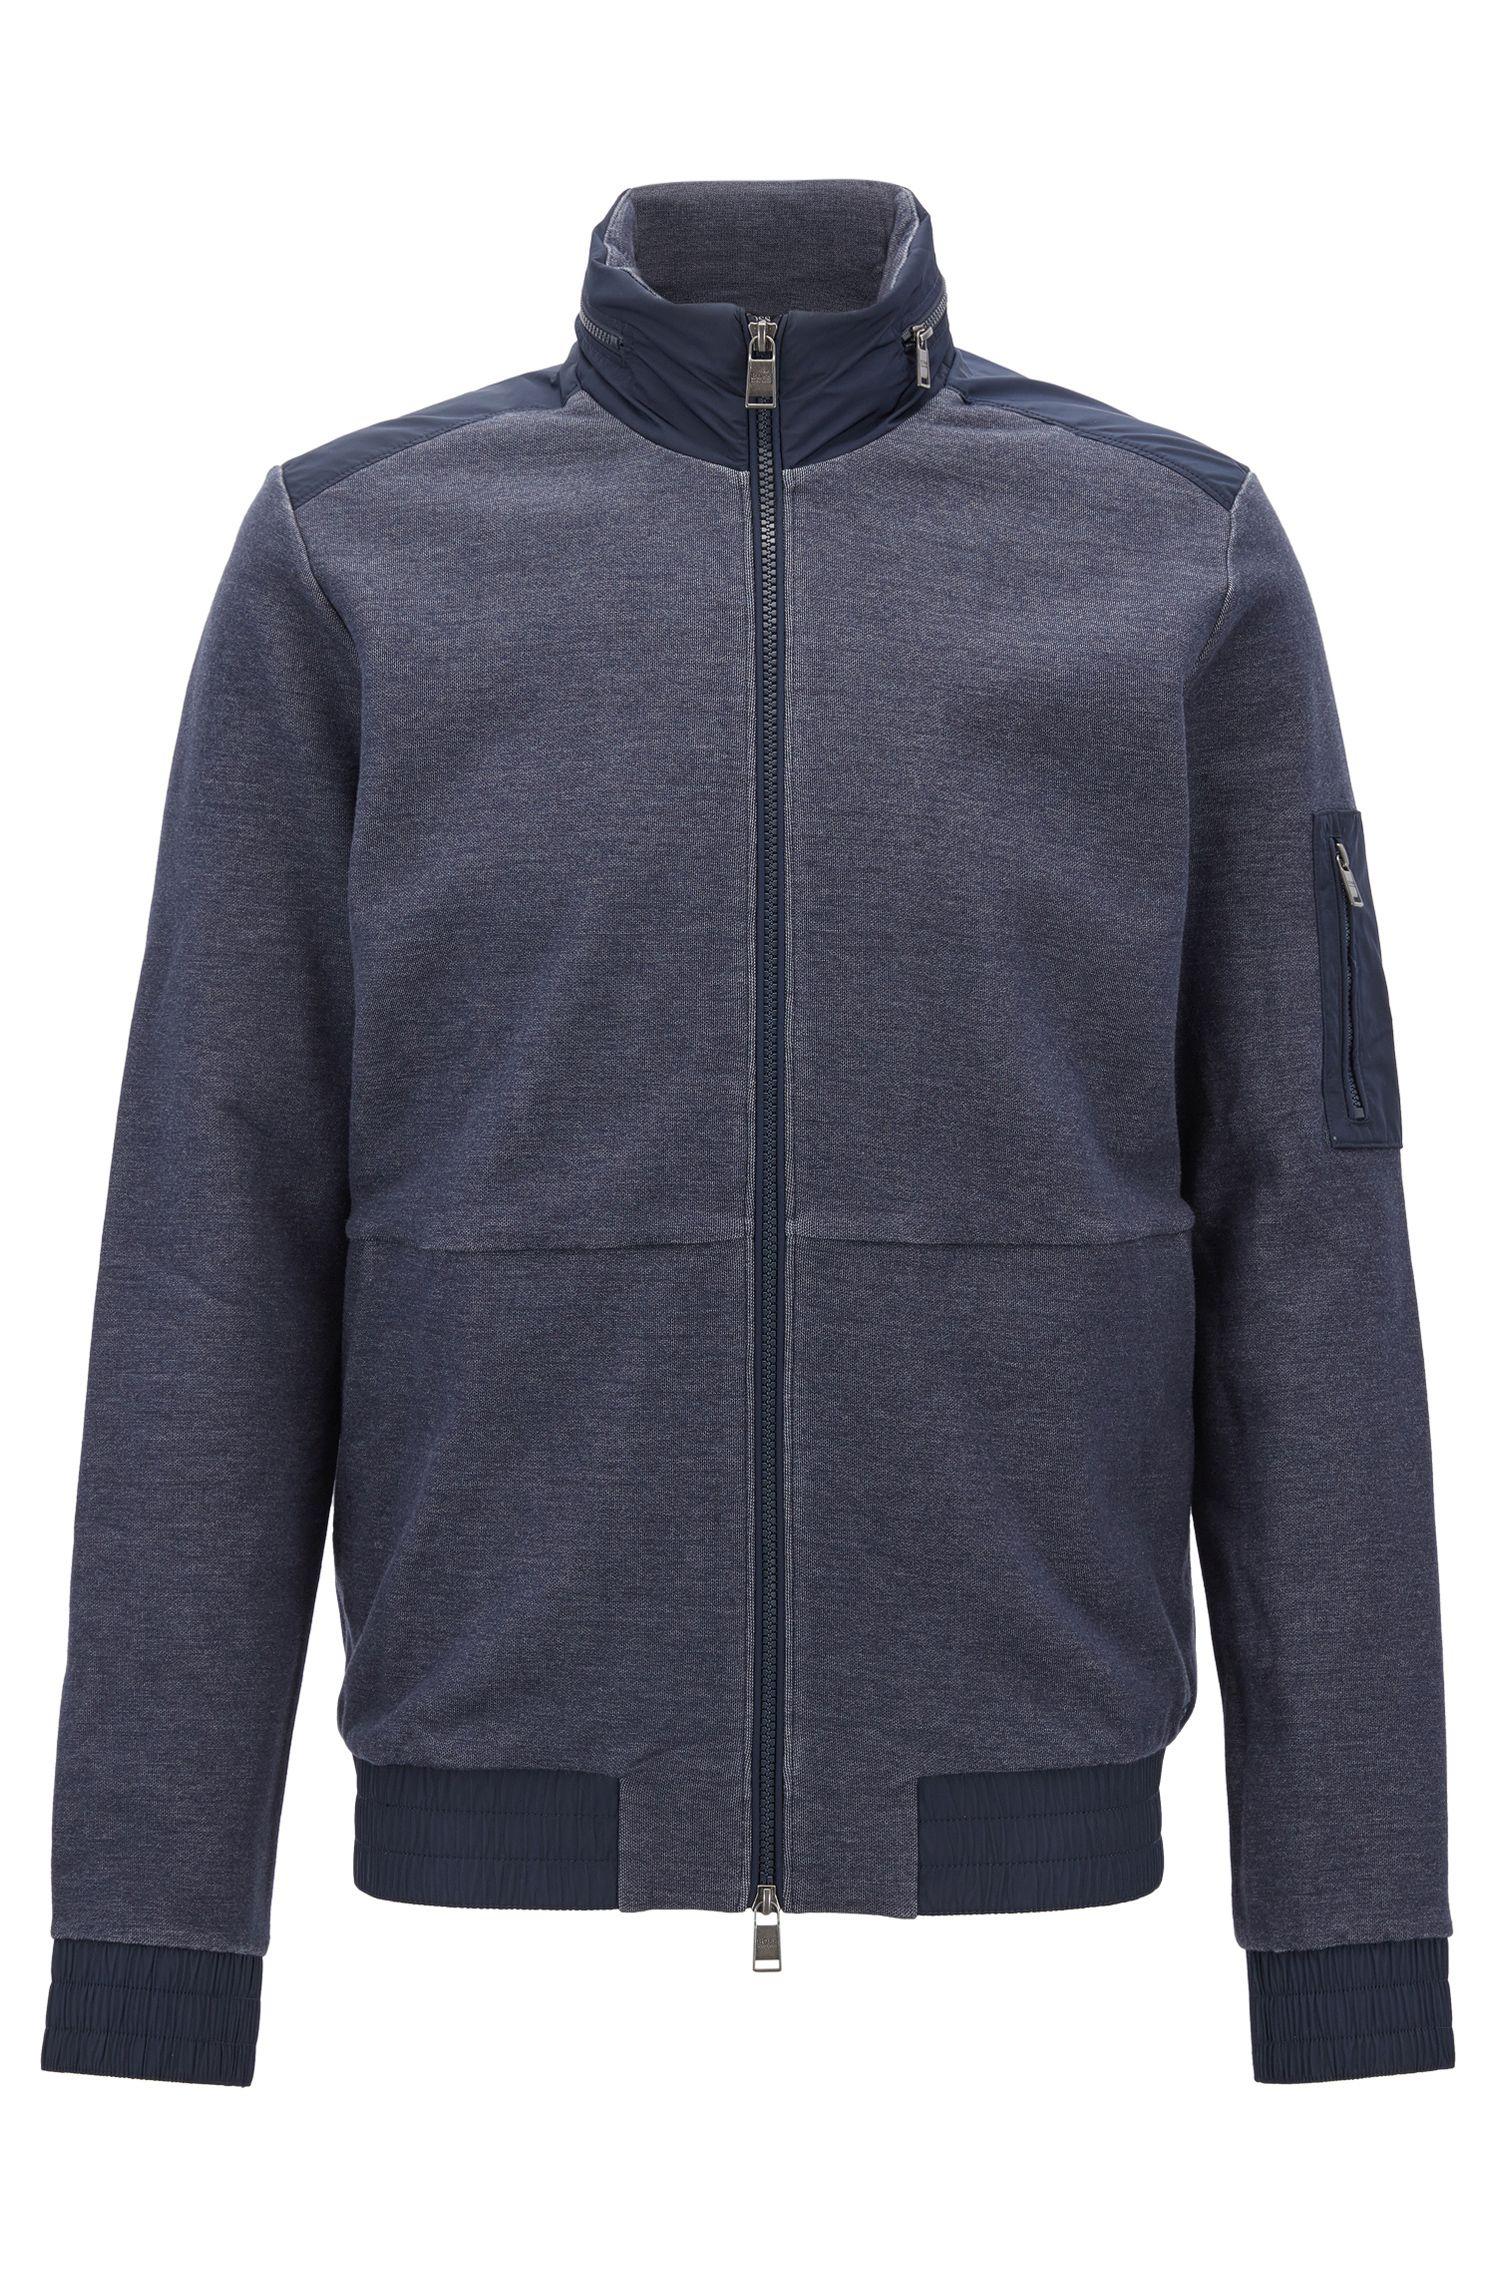 Cotton Denim Jacket | Shepherd